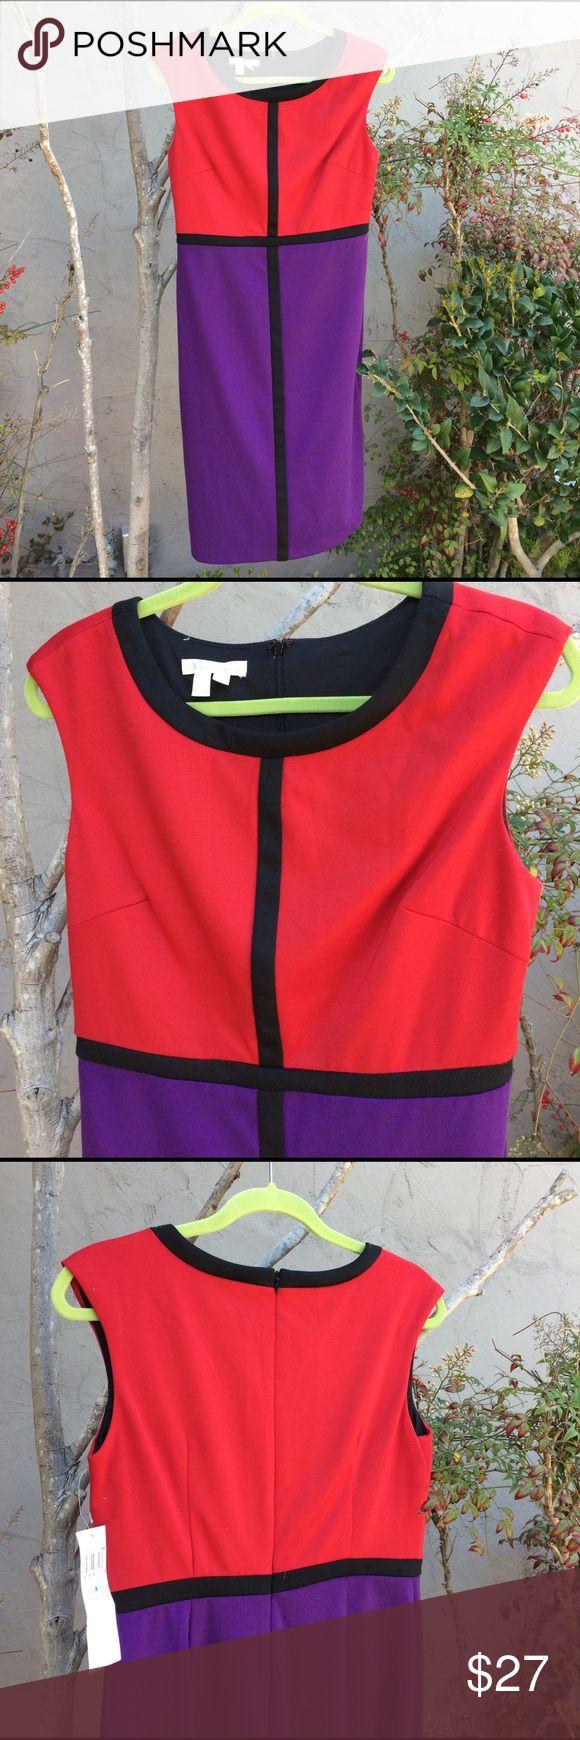 NWT LONDON TIMES DRESS! Pretty block print dress in red& purple with black trim! NWT SZ 8 sleeveless-zip up back made in Vietnam / polyester & spandex London Times Dresses Midi